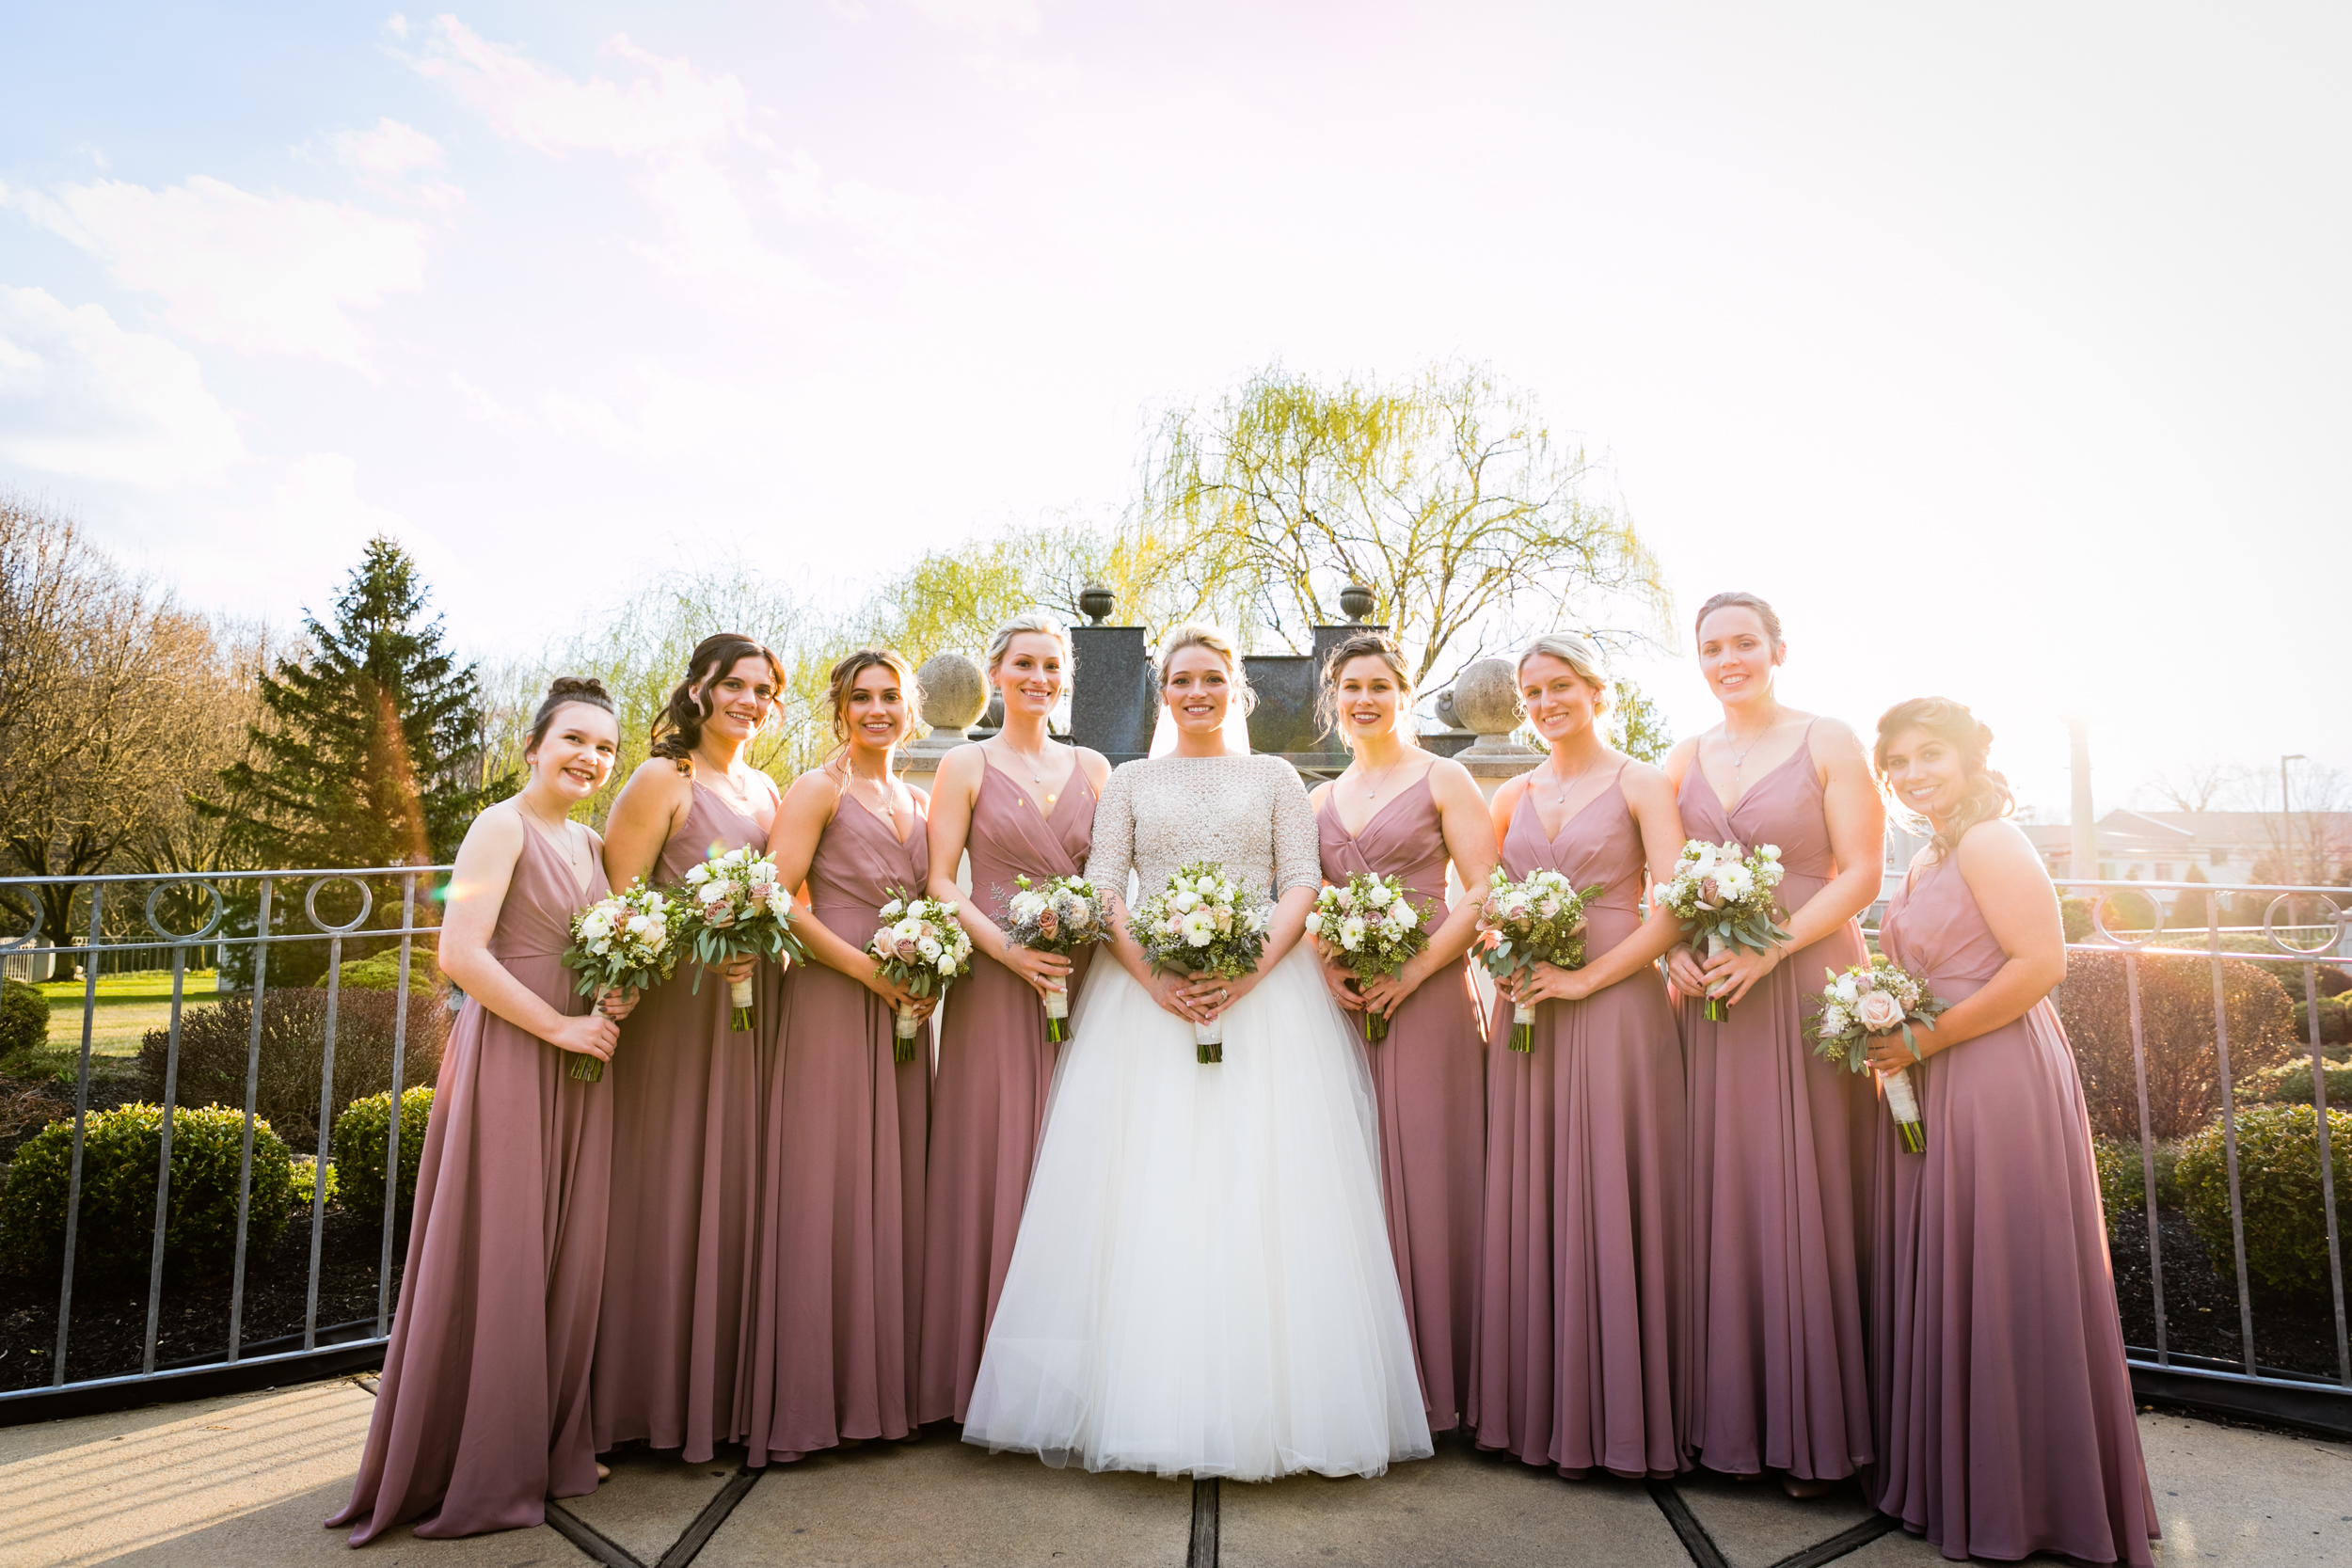 CELEBRATIONS BENSALEM WEDDING PHOTOGRAPHY-59.jpg